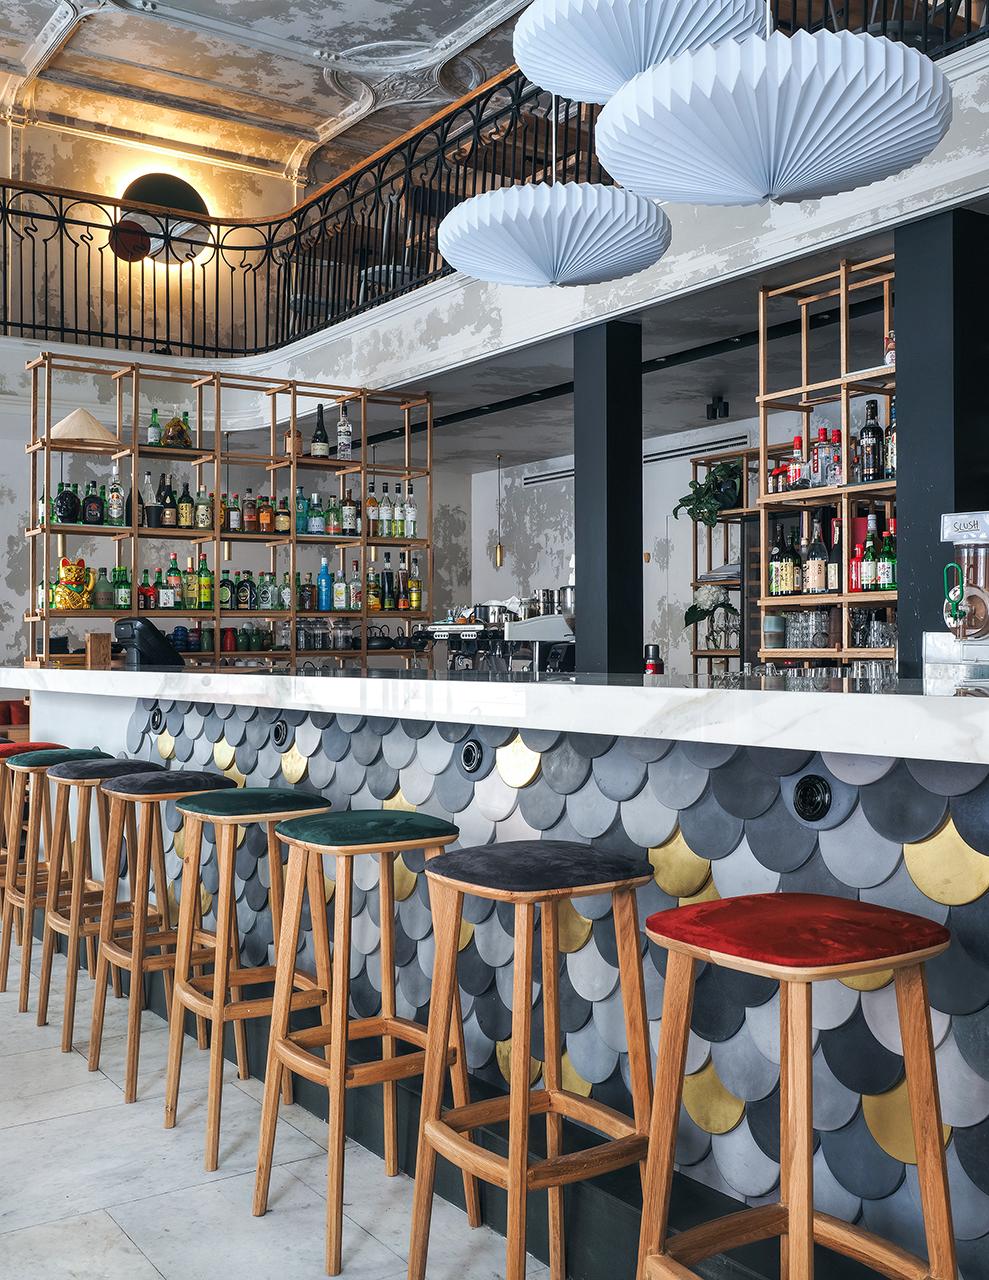 china restaurant bar wood Interior design art modernarchitecture tiles